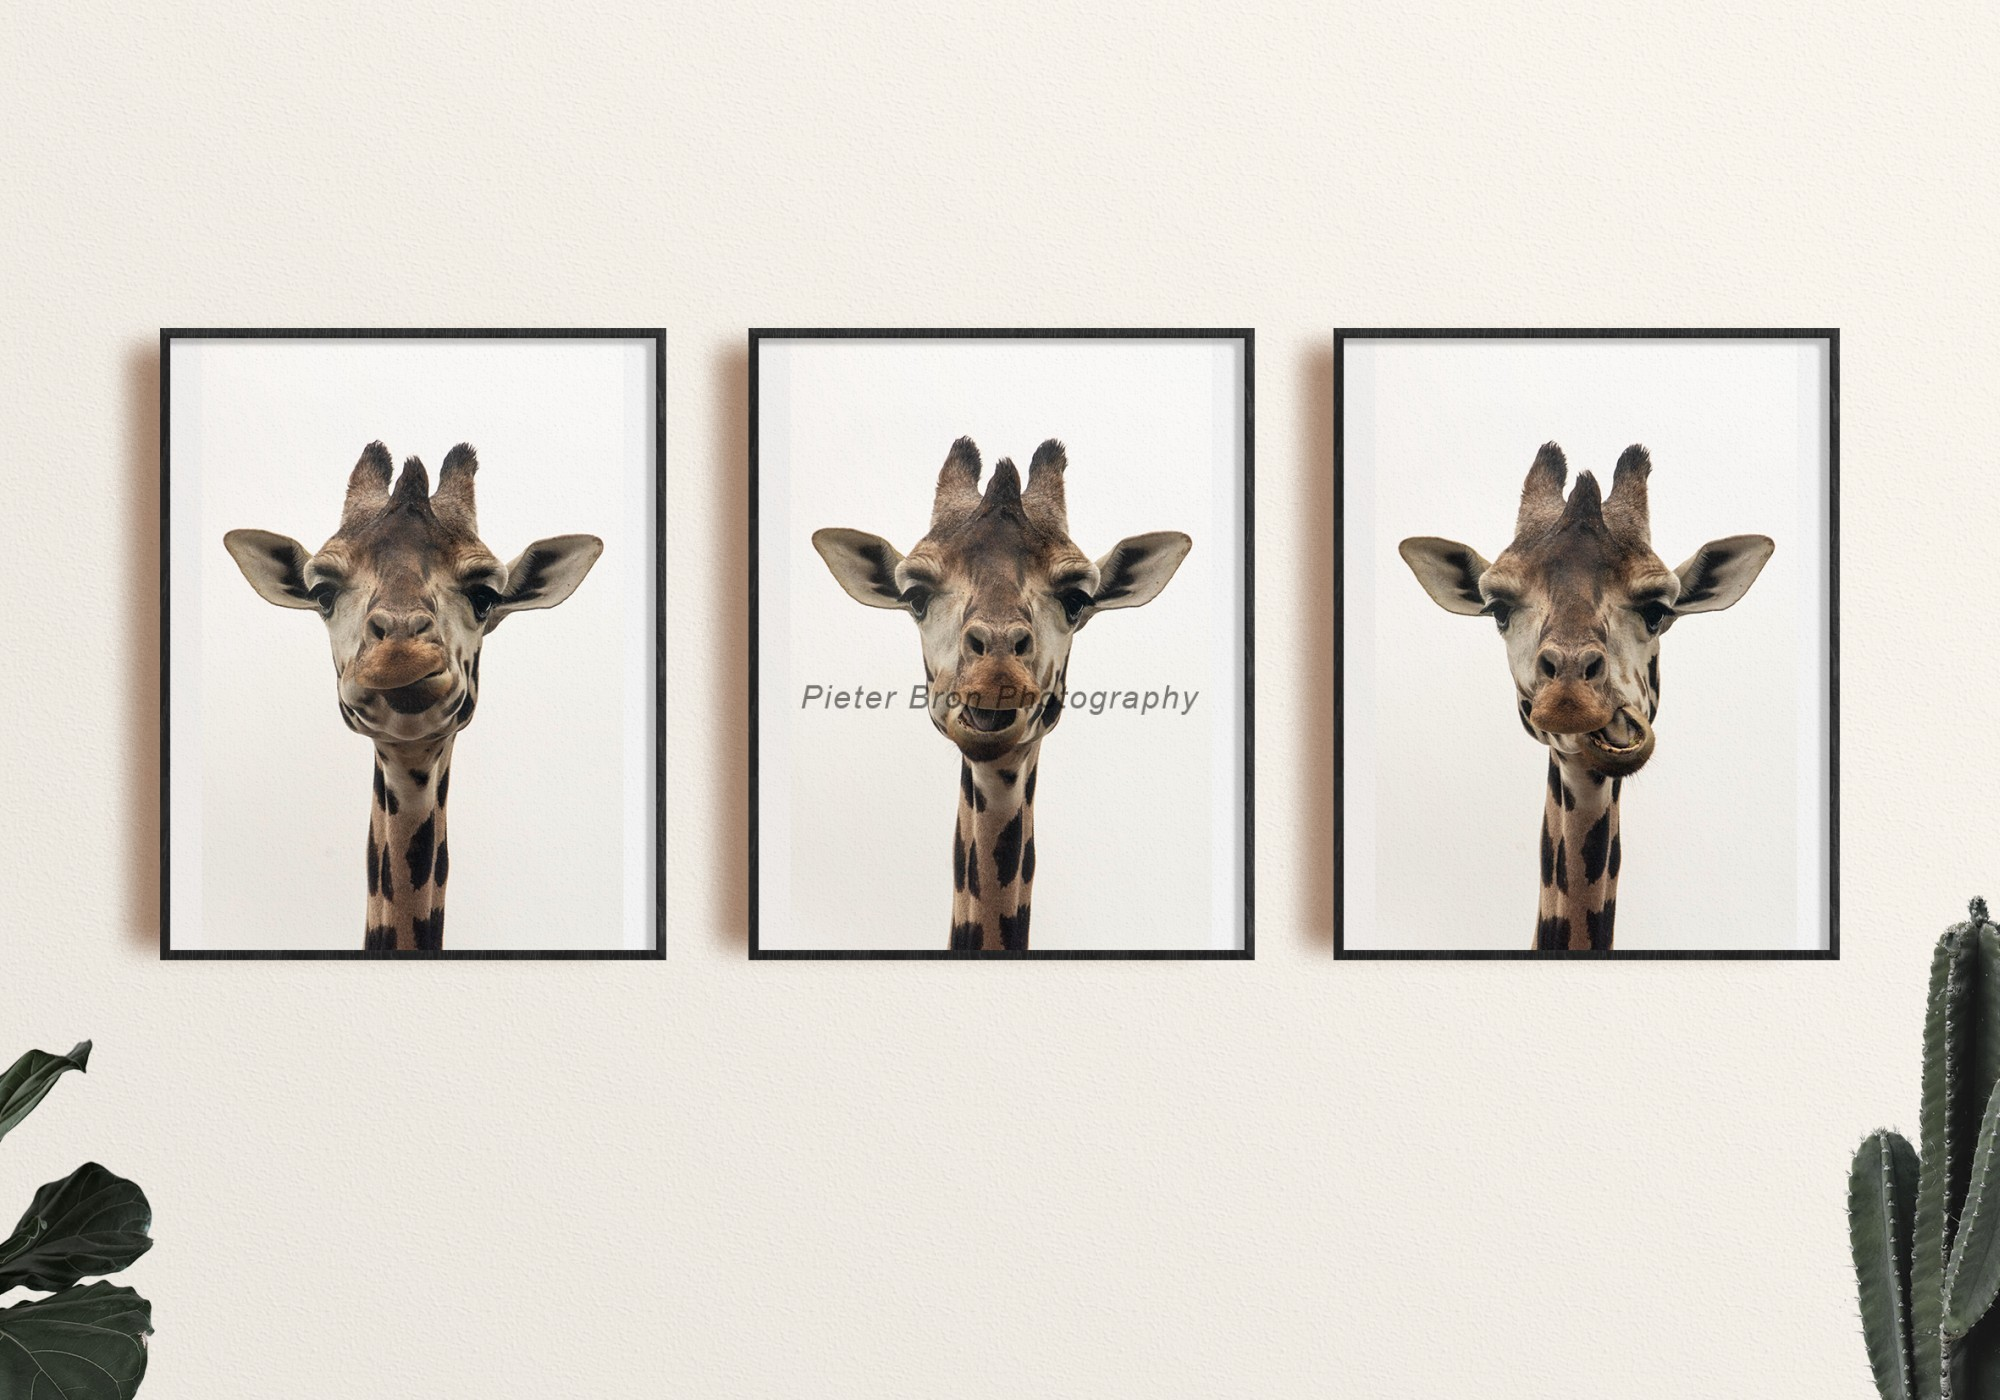 Triptych of Giraffes, Beekse Bergen, Netherlands